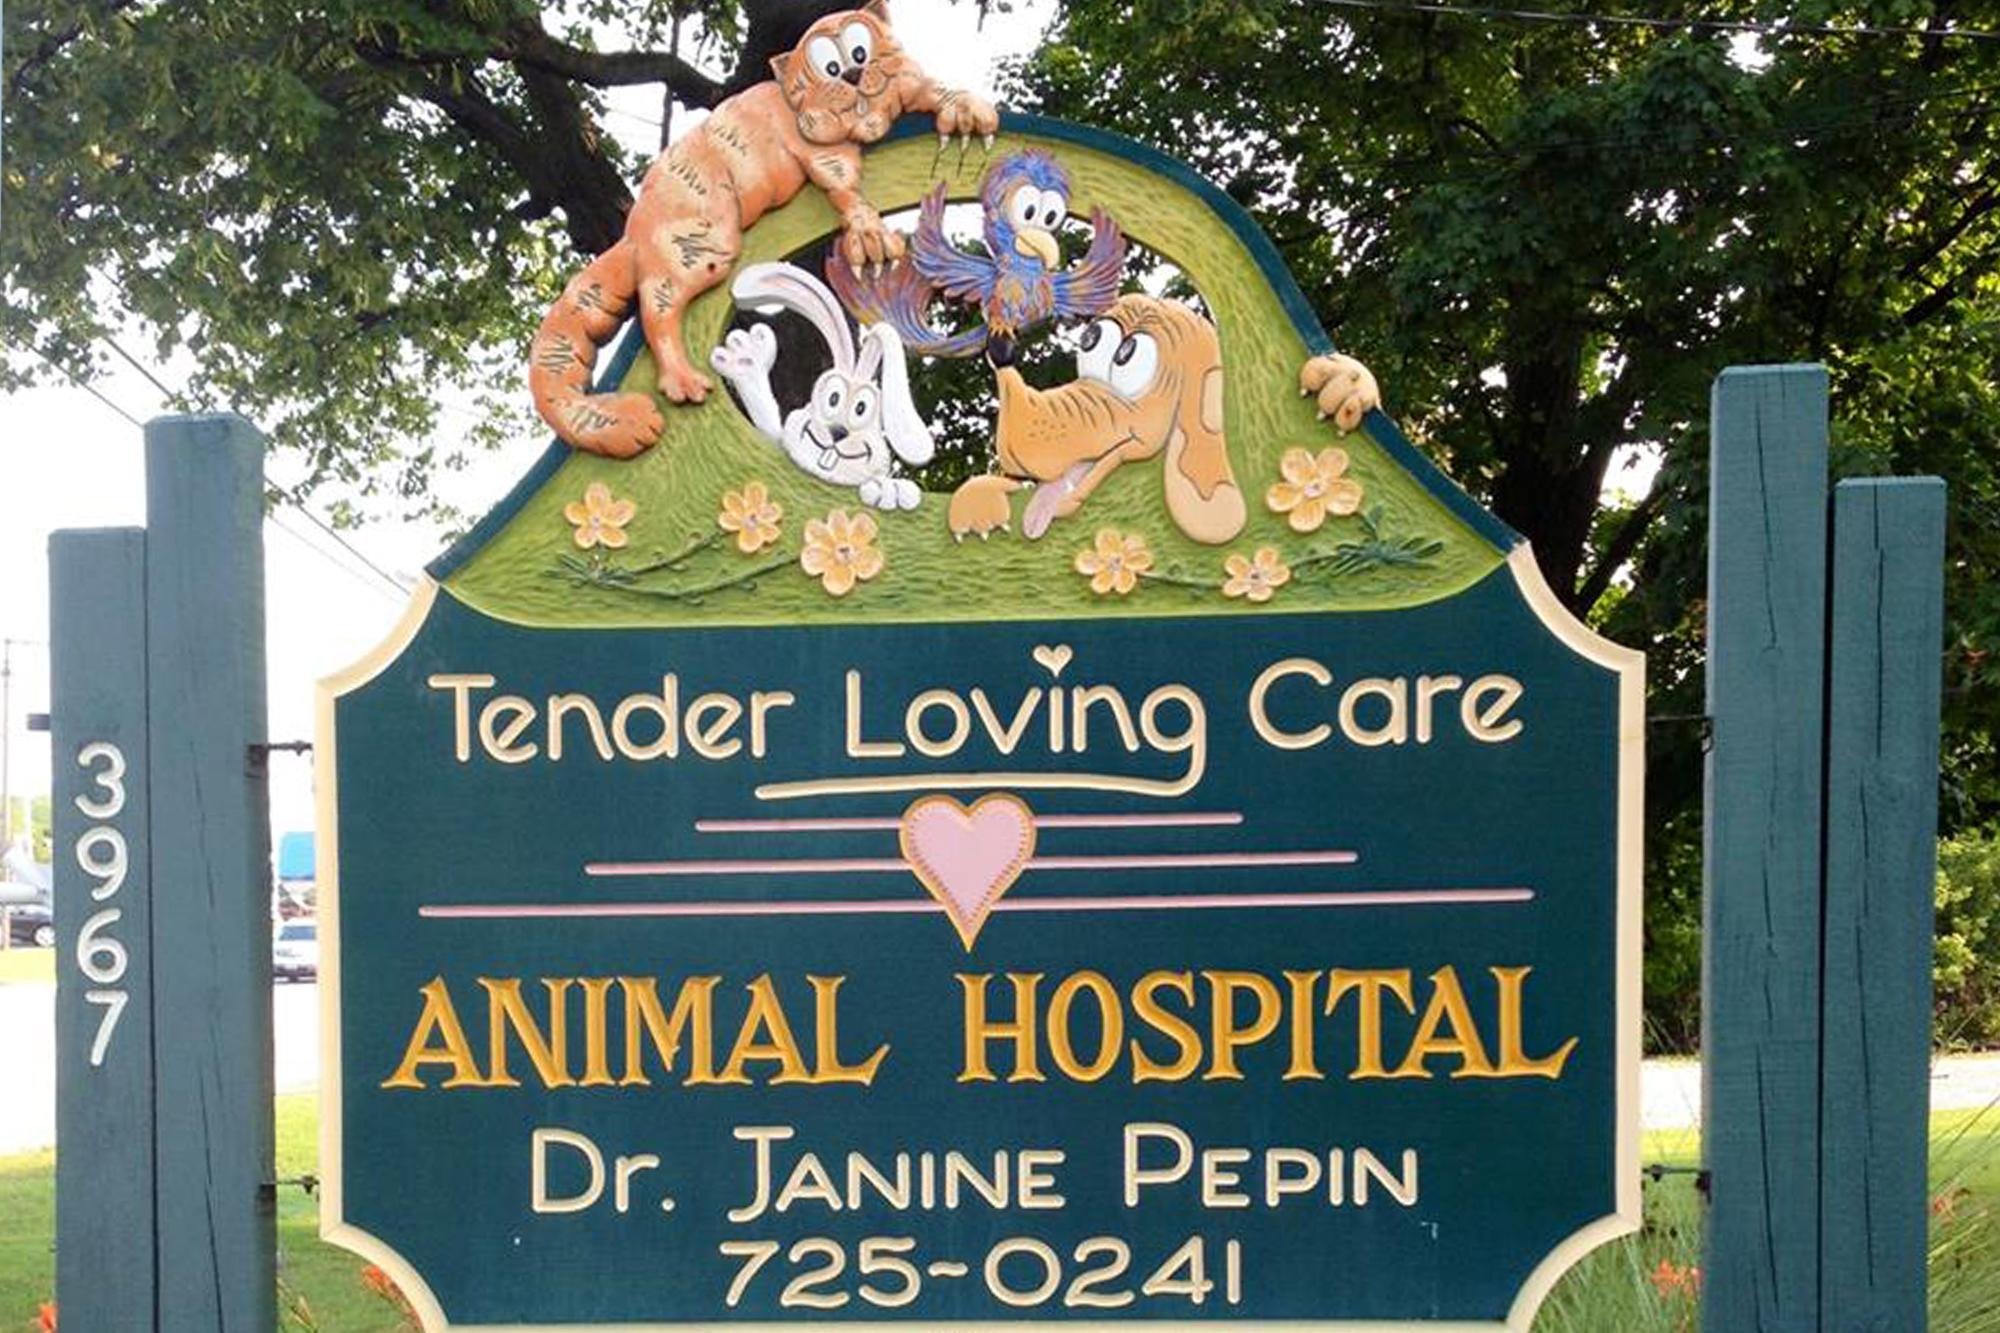 Comprehensive pet care including vaccination services, internal medicine, surgery, radiology, dentistry & behavior consultation.